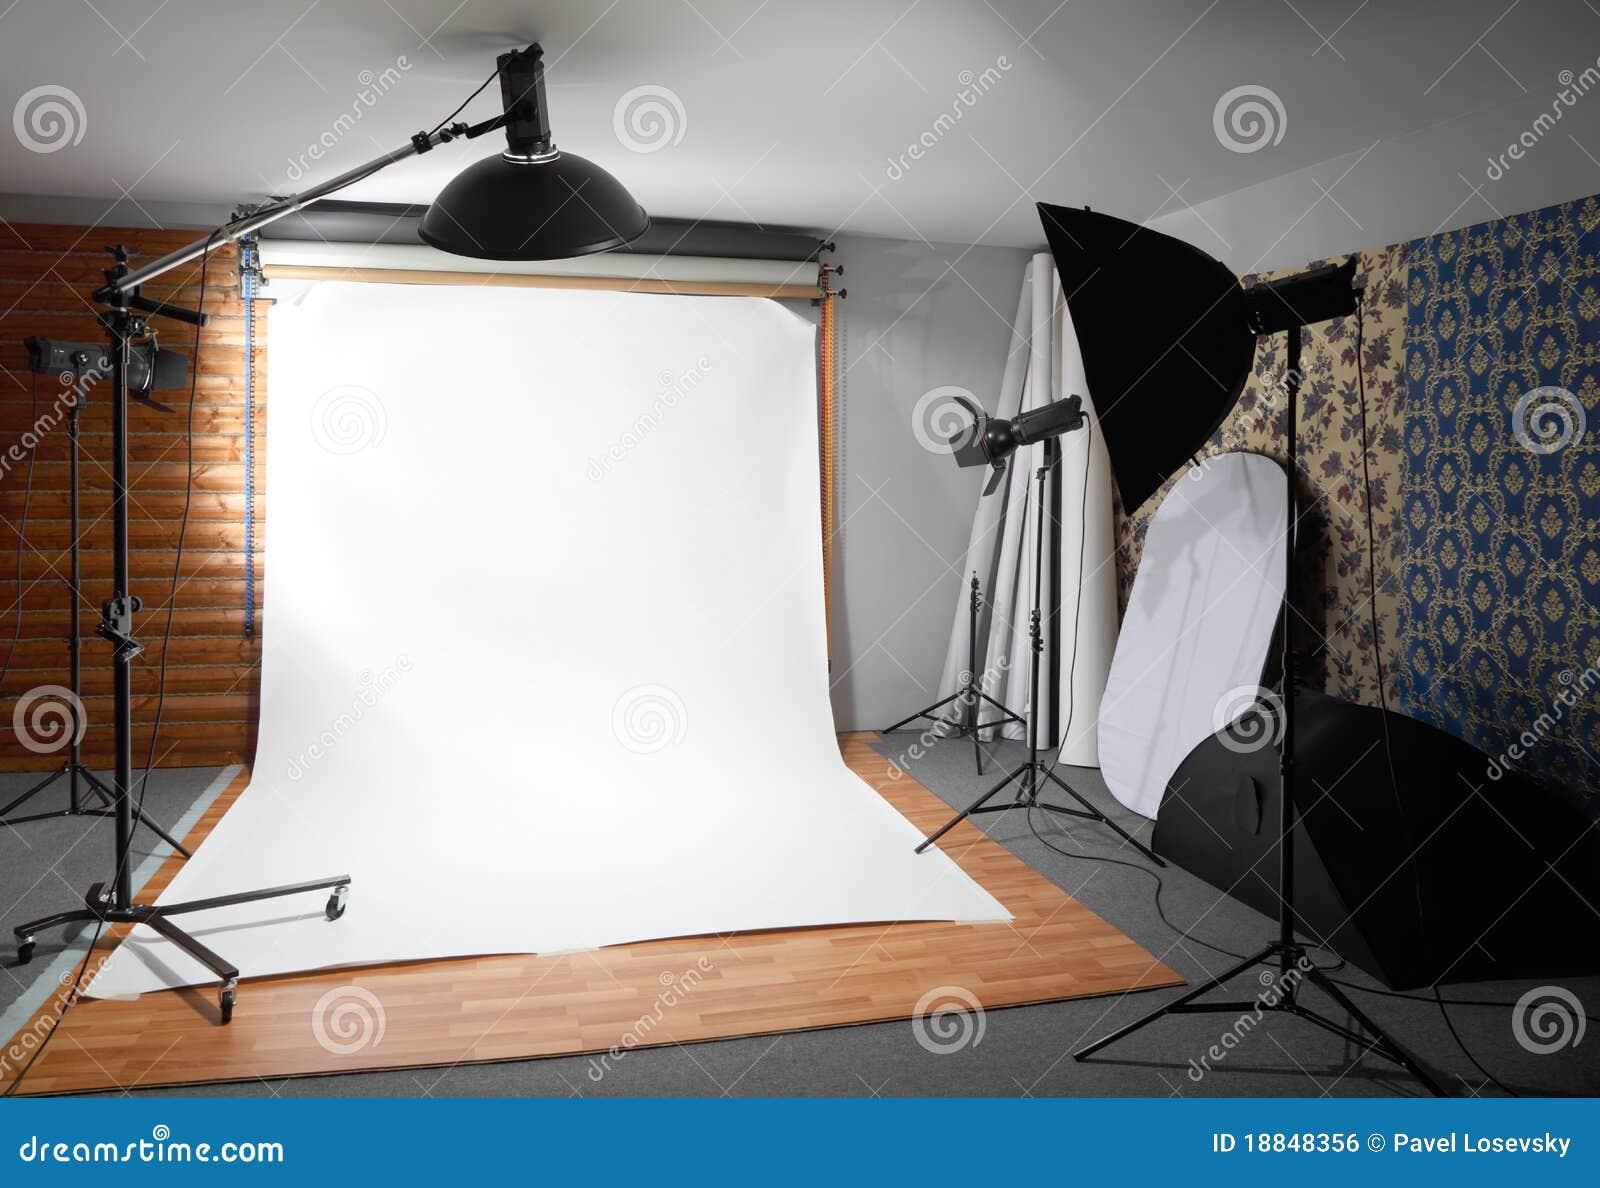 White background inside studio - lighted lamps